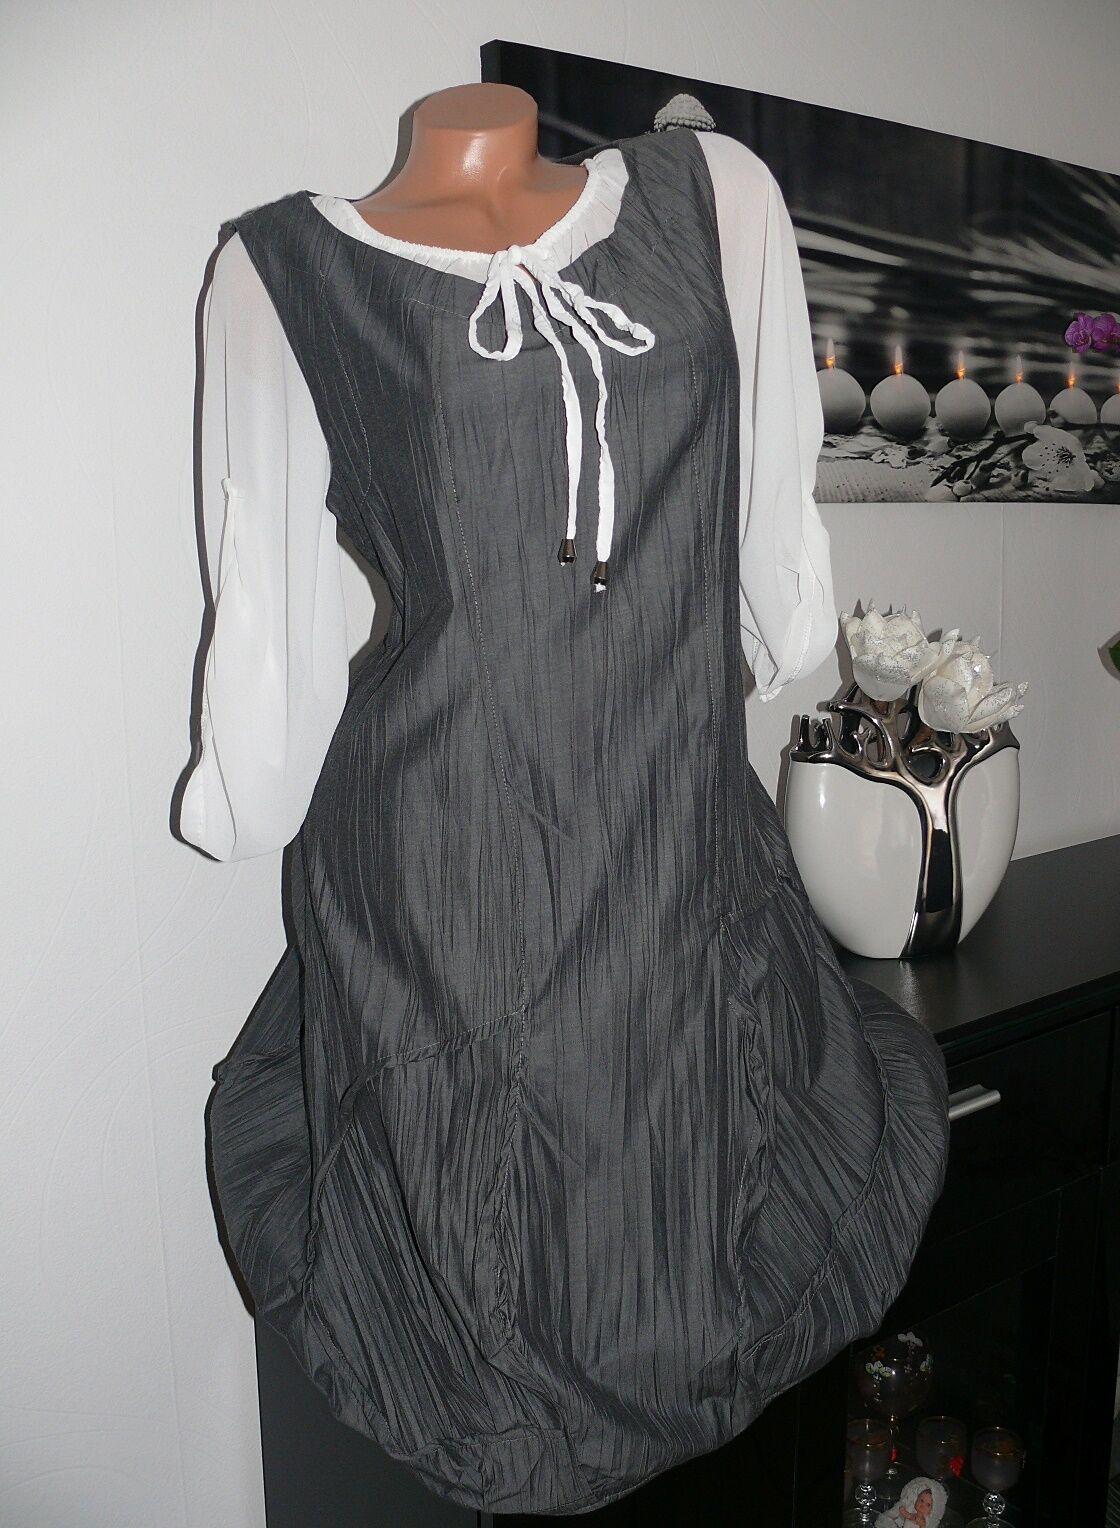 ♥ Kleid Tunika Stiefelkleid Lagenlook Ballonkleid elegant grau ITALY 40 42 NEU ♥